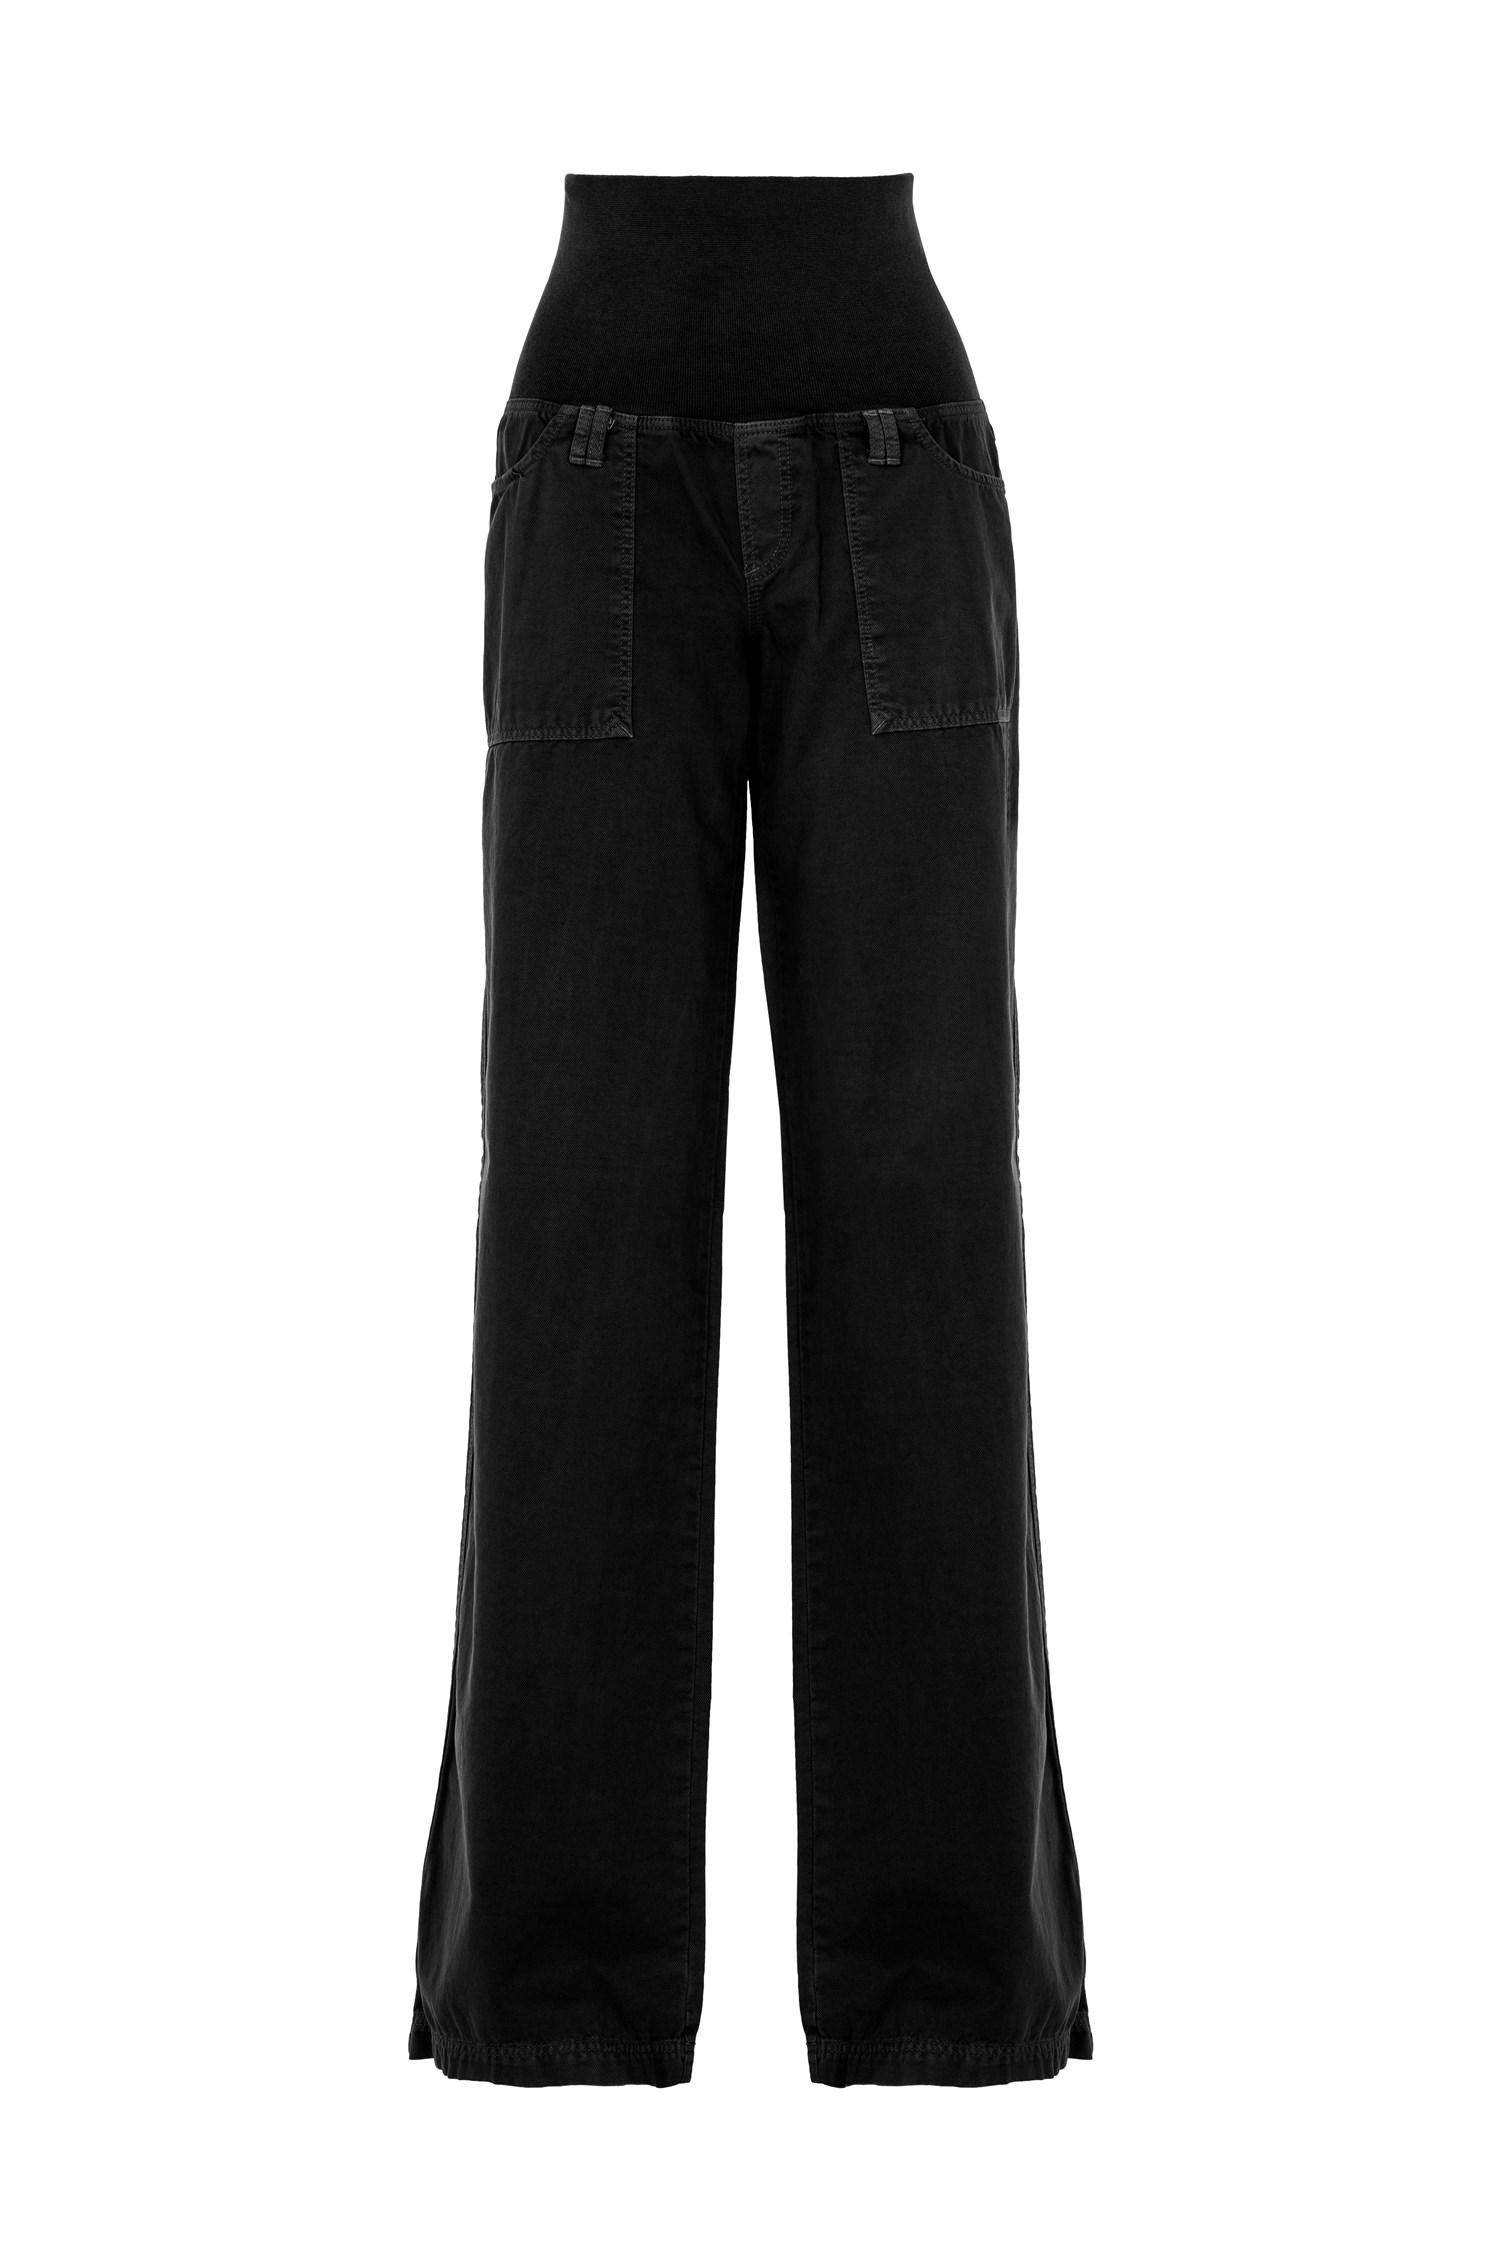 Bayan Siyah Beli Lastikli Bol Pantolon